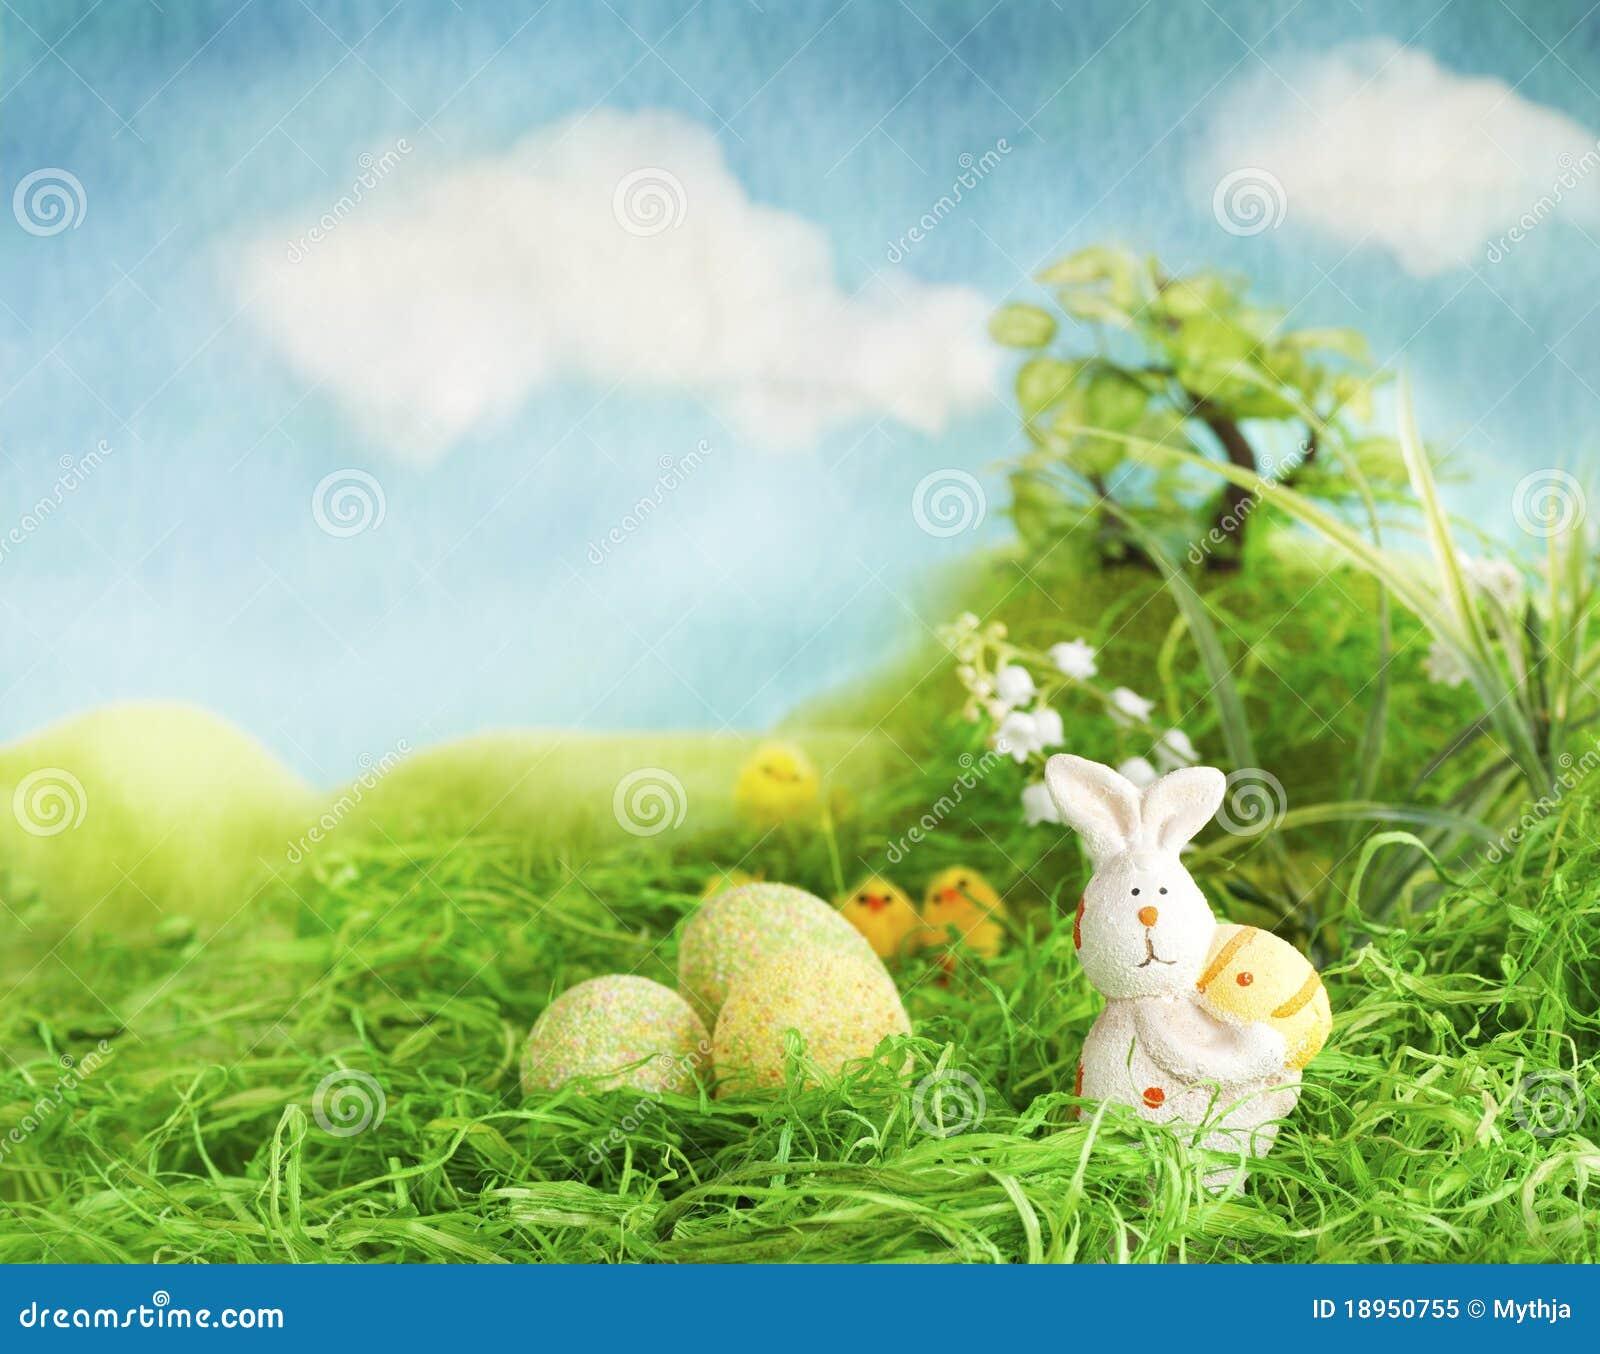 Easter Scene Royalty Free Stock Photo - Image: 18950755